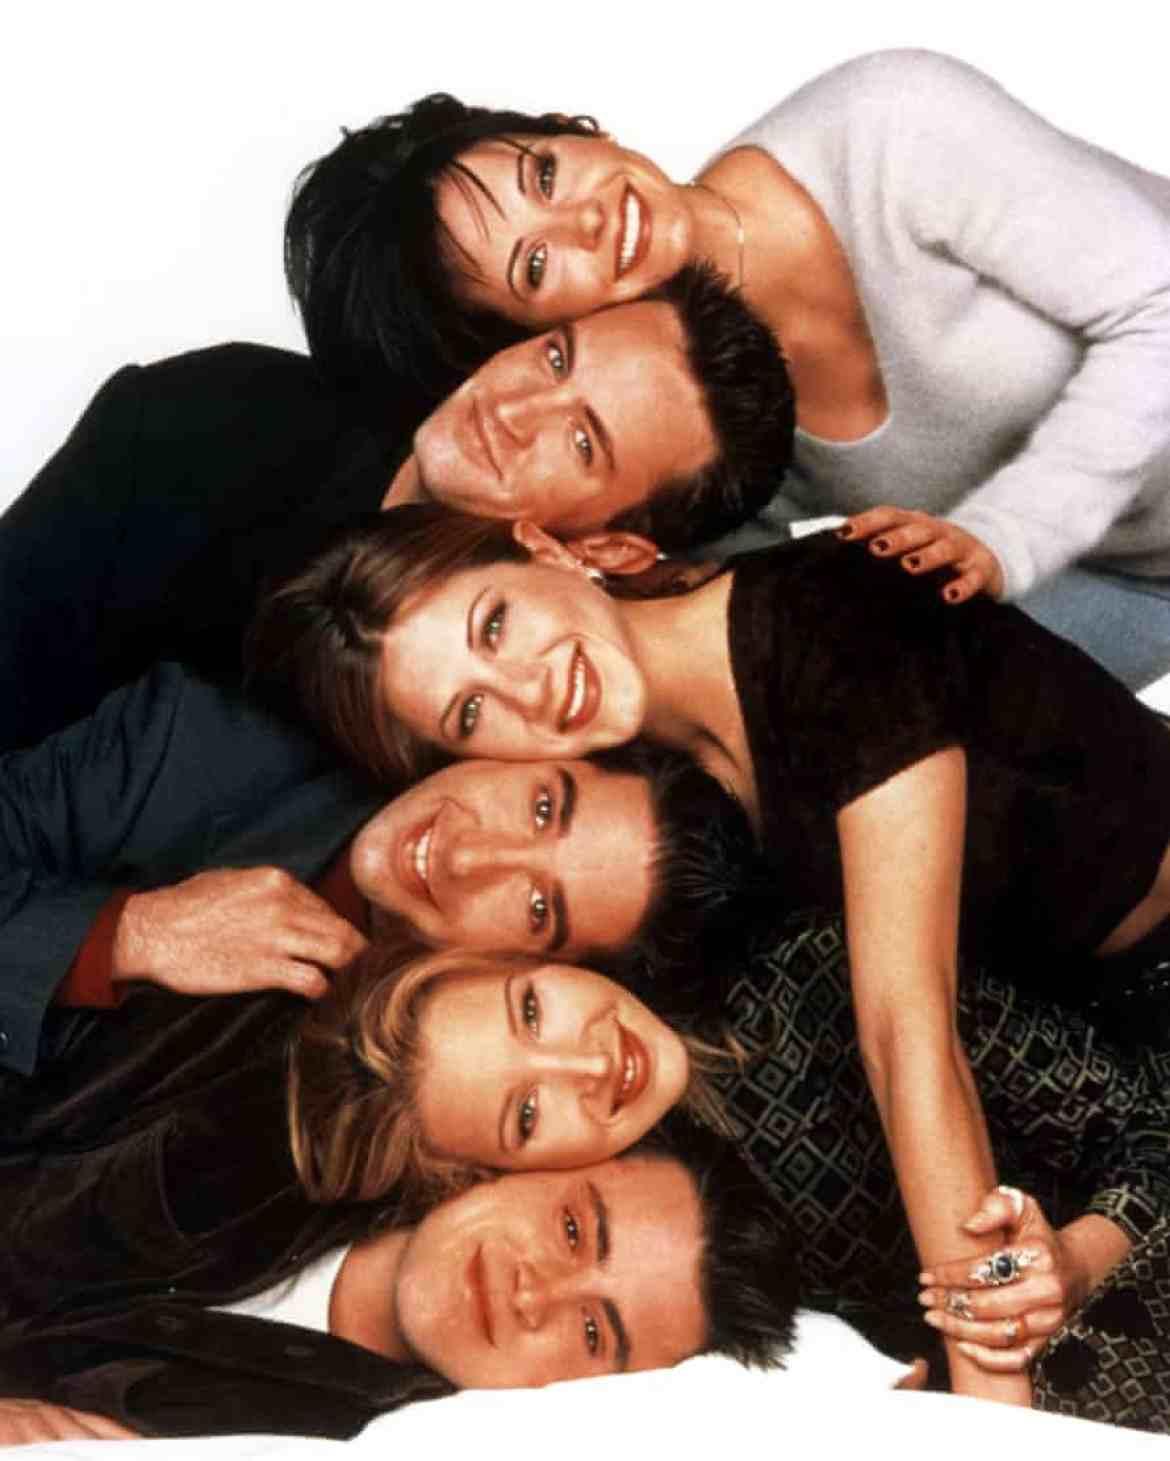 FRIENDS, from top: Courtney Arquette, Matthew Perry, Jennifer Aniston, David Schwimmer, Lisa Kudrow and Matt LeBlanc.